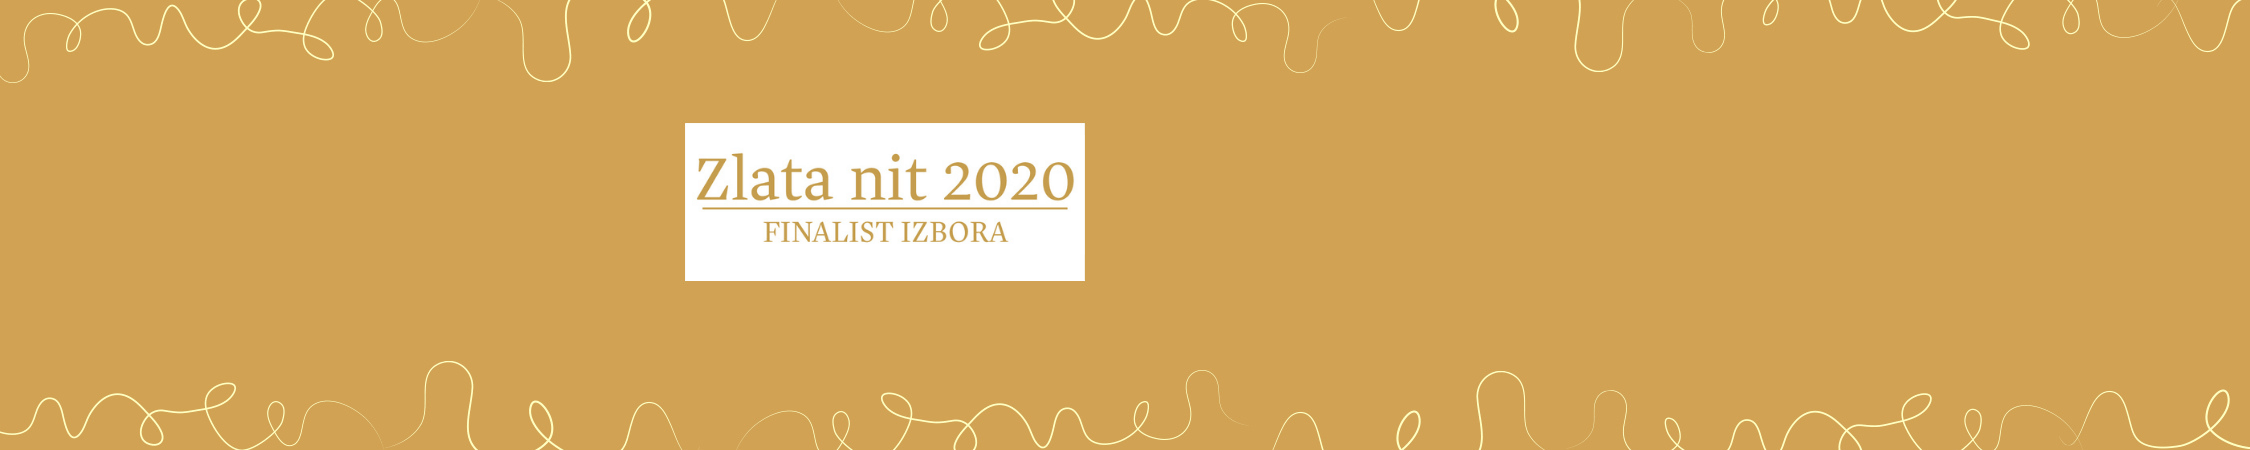 FInalisti Zlate niti 2020